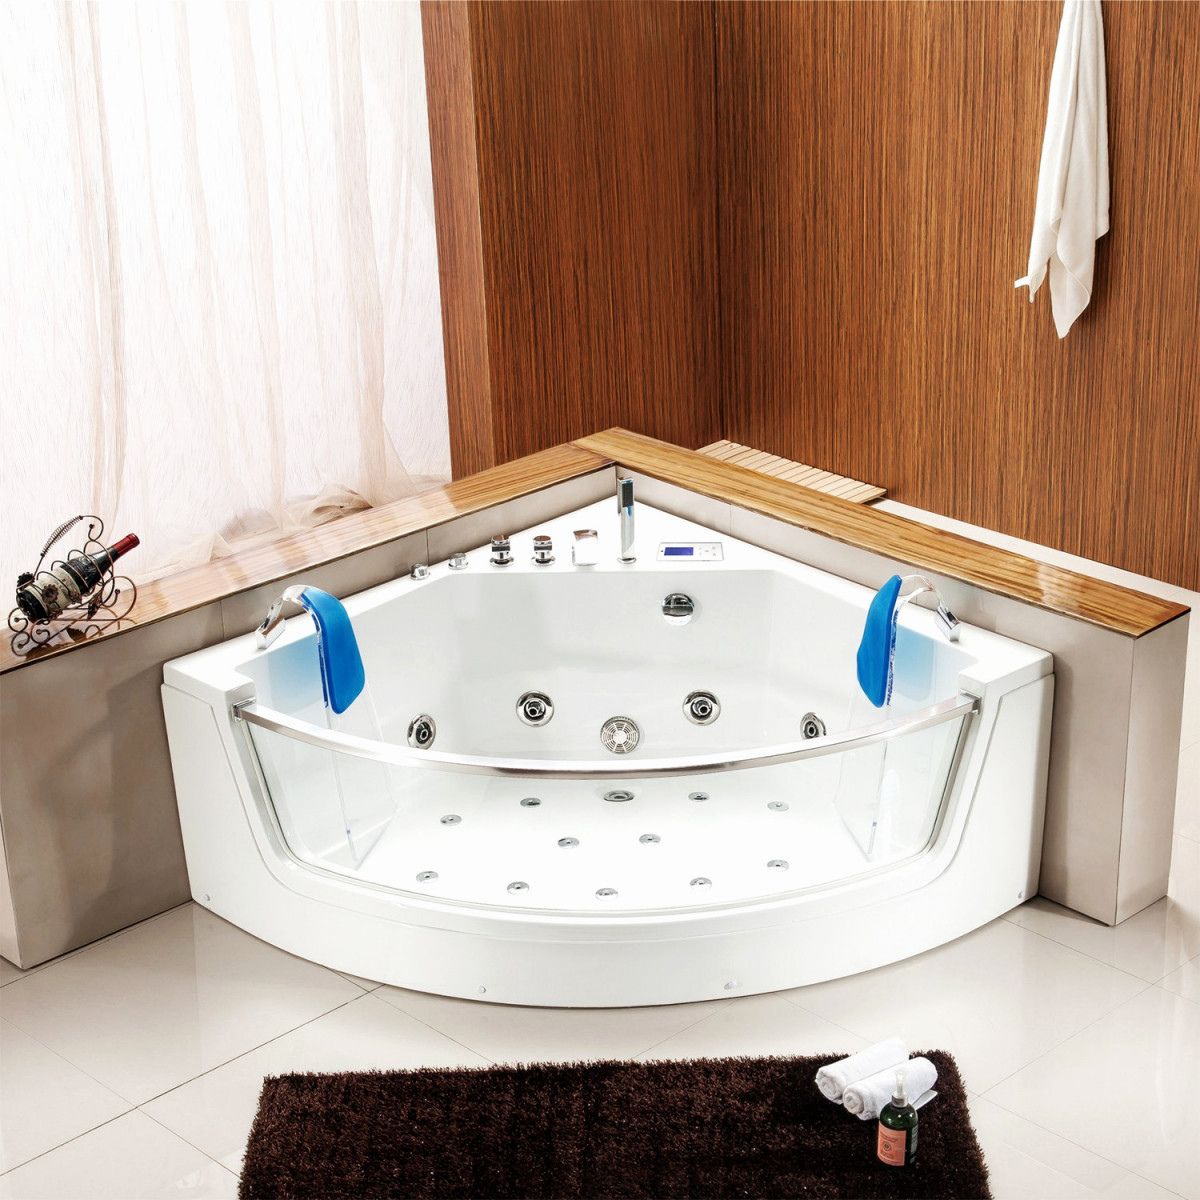 201 Baignoire Douche Avec Porte Pas Cher 2020 Corner Bathtub Bathtub Bathroom